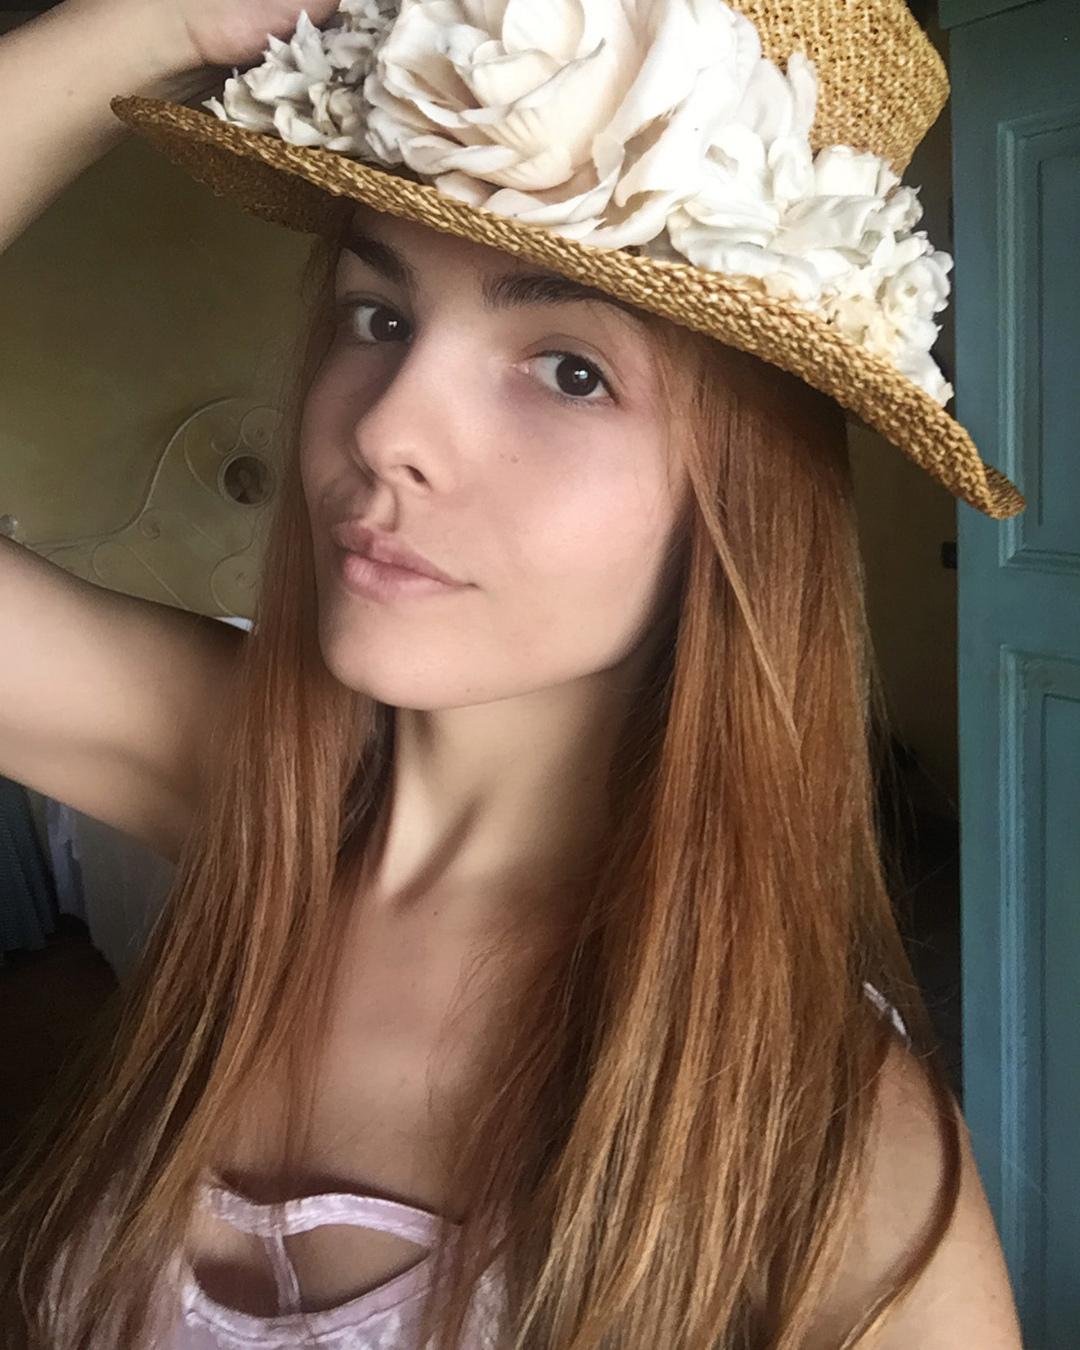 nathalie de oliveira, miss bom jardim 2019/1st runner-up de miss international queen 2016. - Página 3 38748010